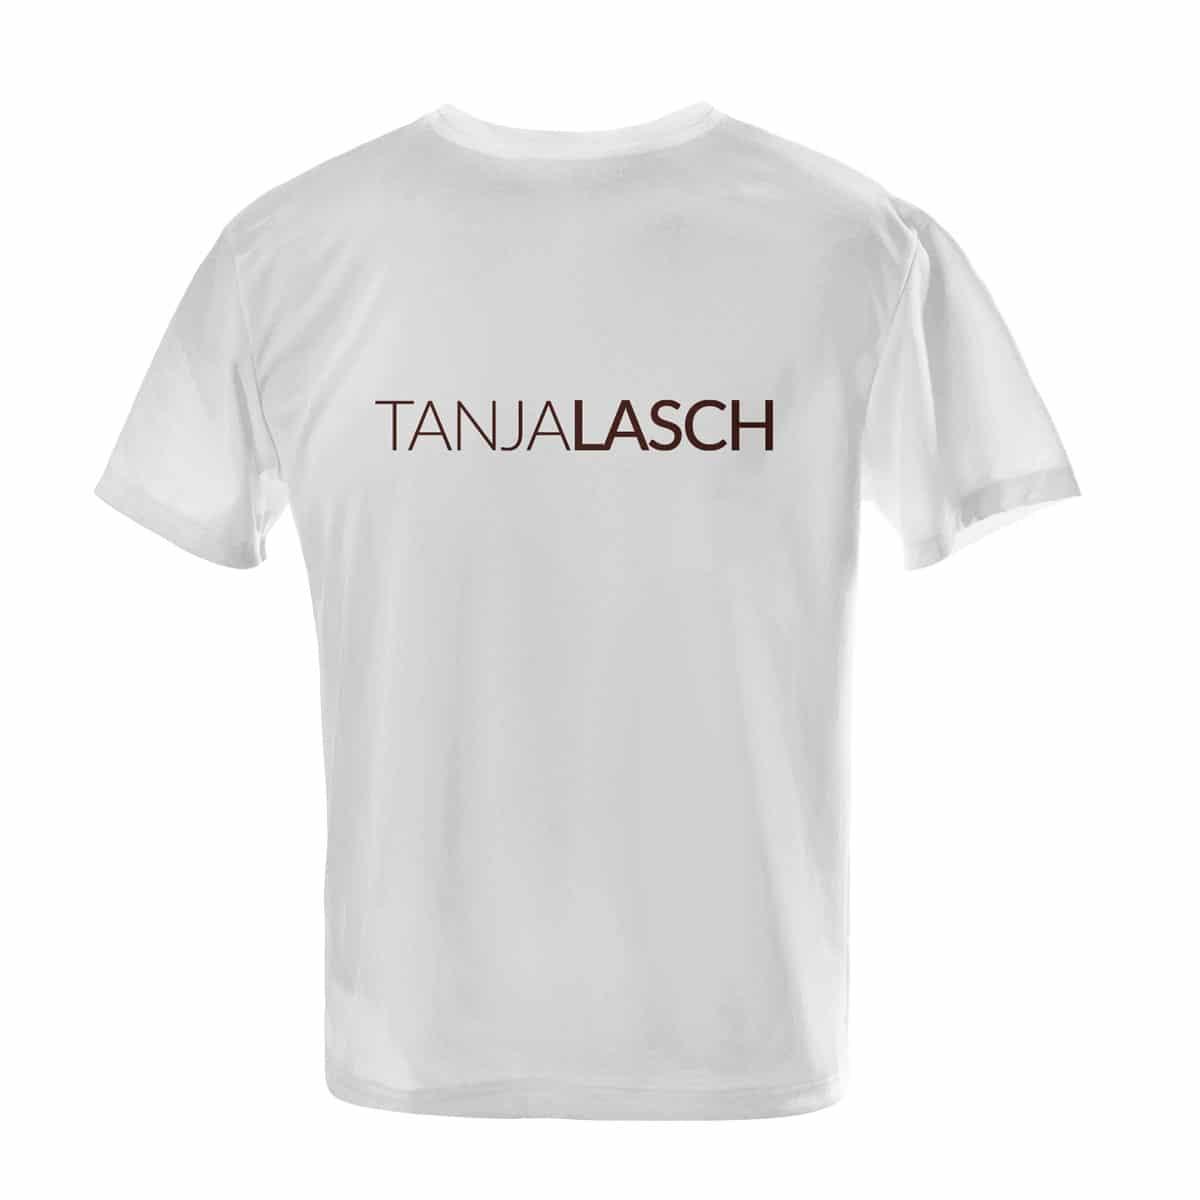 Tanja Lasch Herzkino T-Shirt bestellen